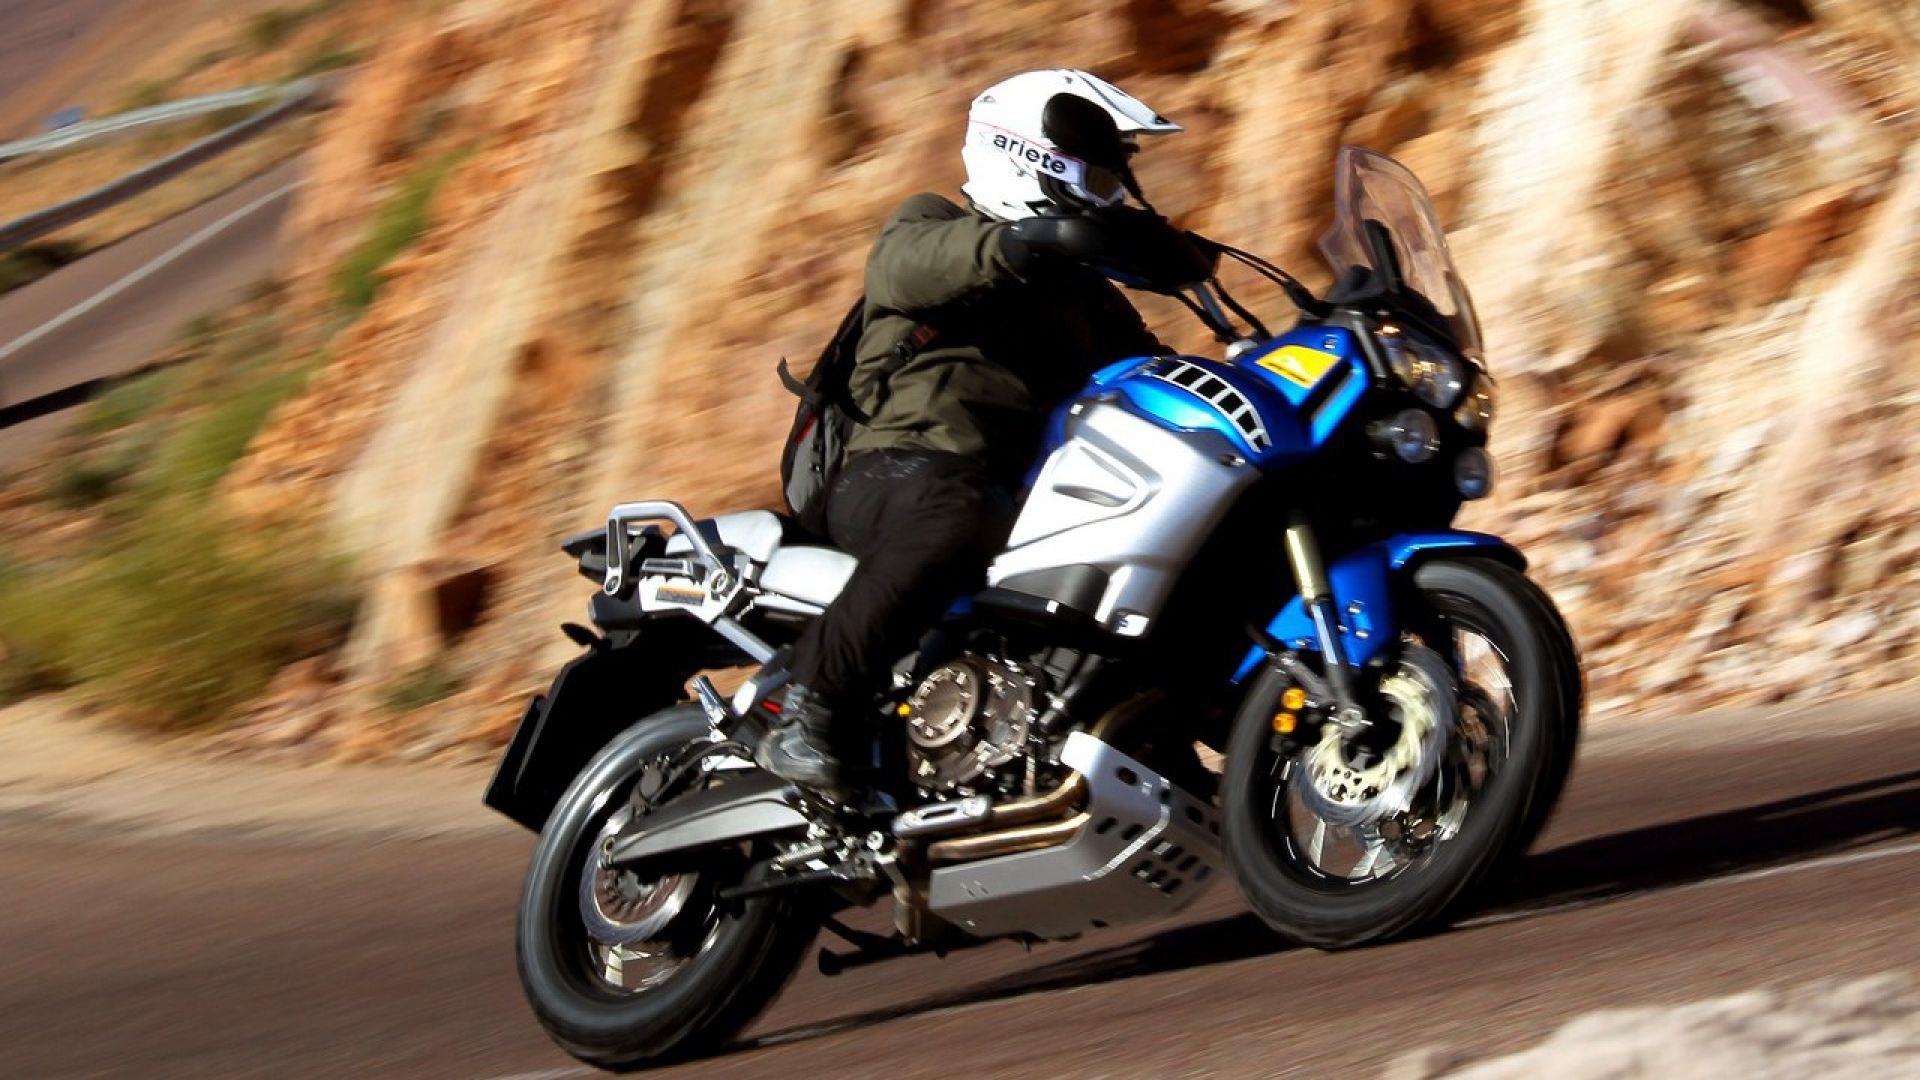 Immagine 175: In Marocco con la Yamaha Super Ténéré